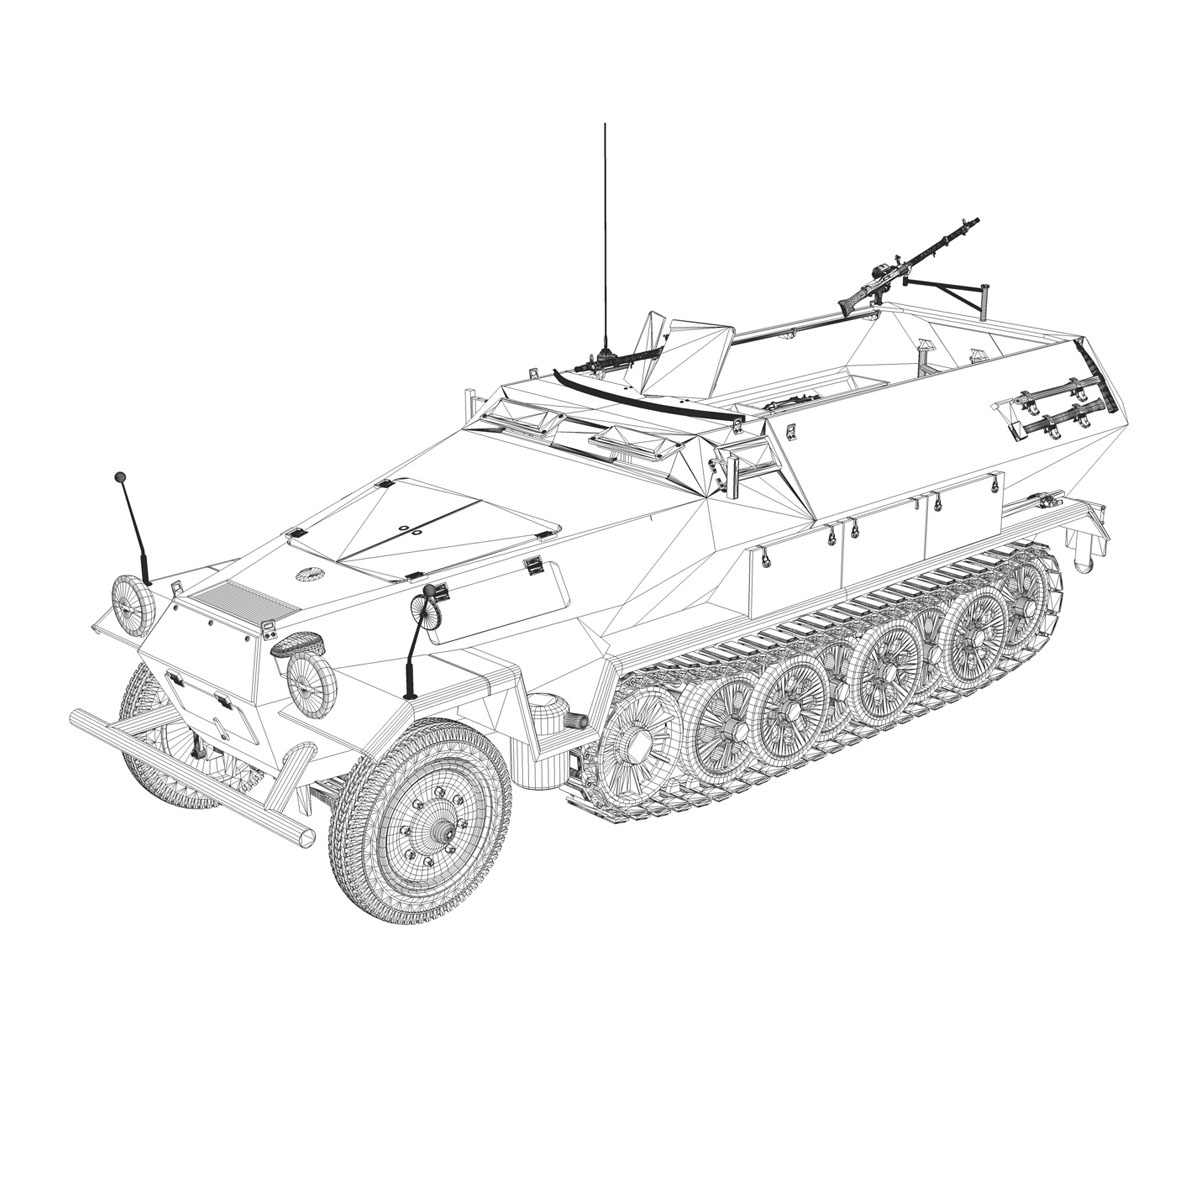 sd.kfz 251 1 ausf.b – hanomag halftruck dak – 15pd 3d model 3ds fbx c4d lwo obj 201307